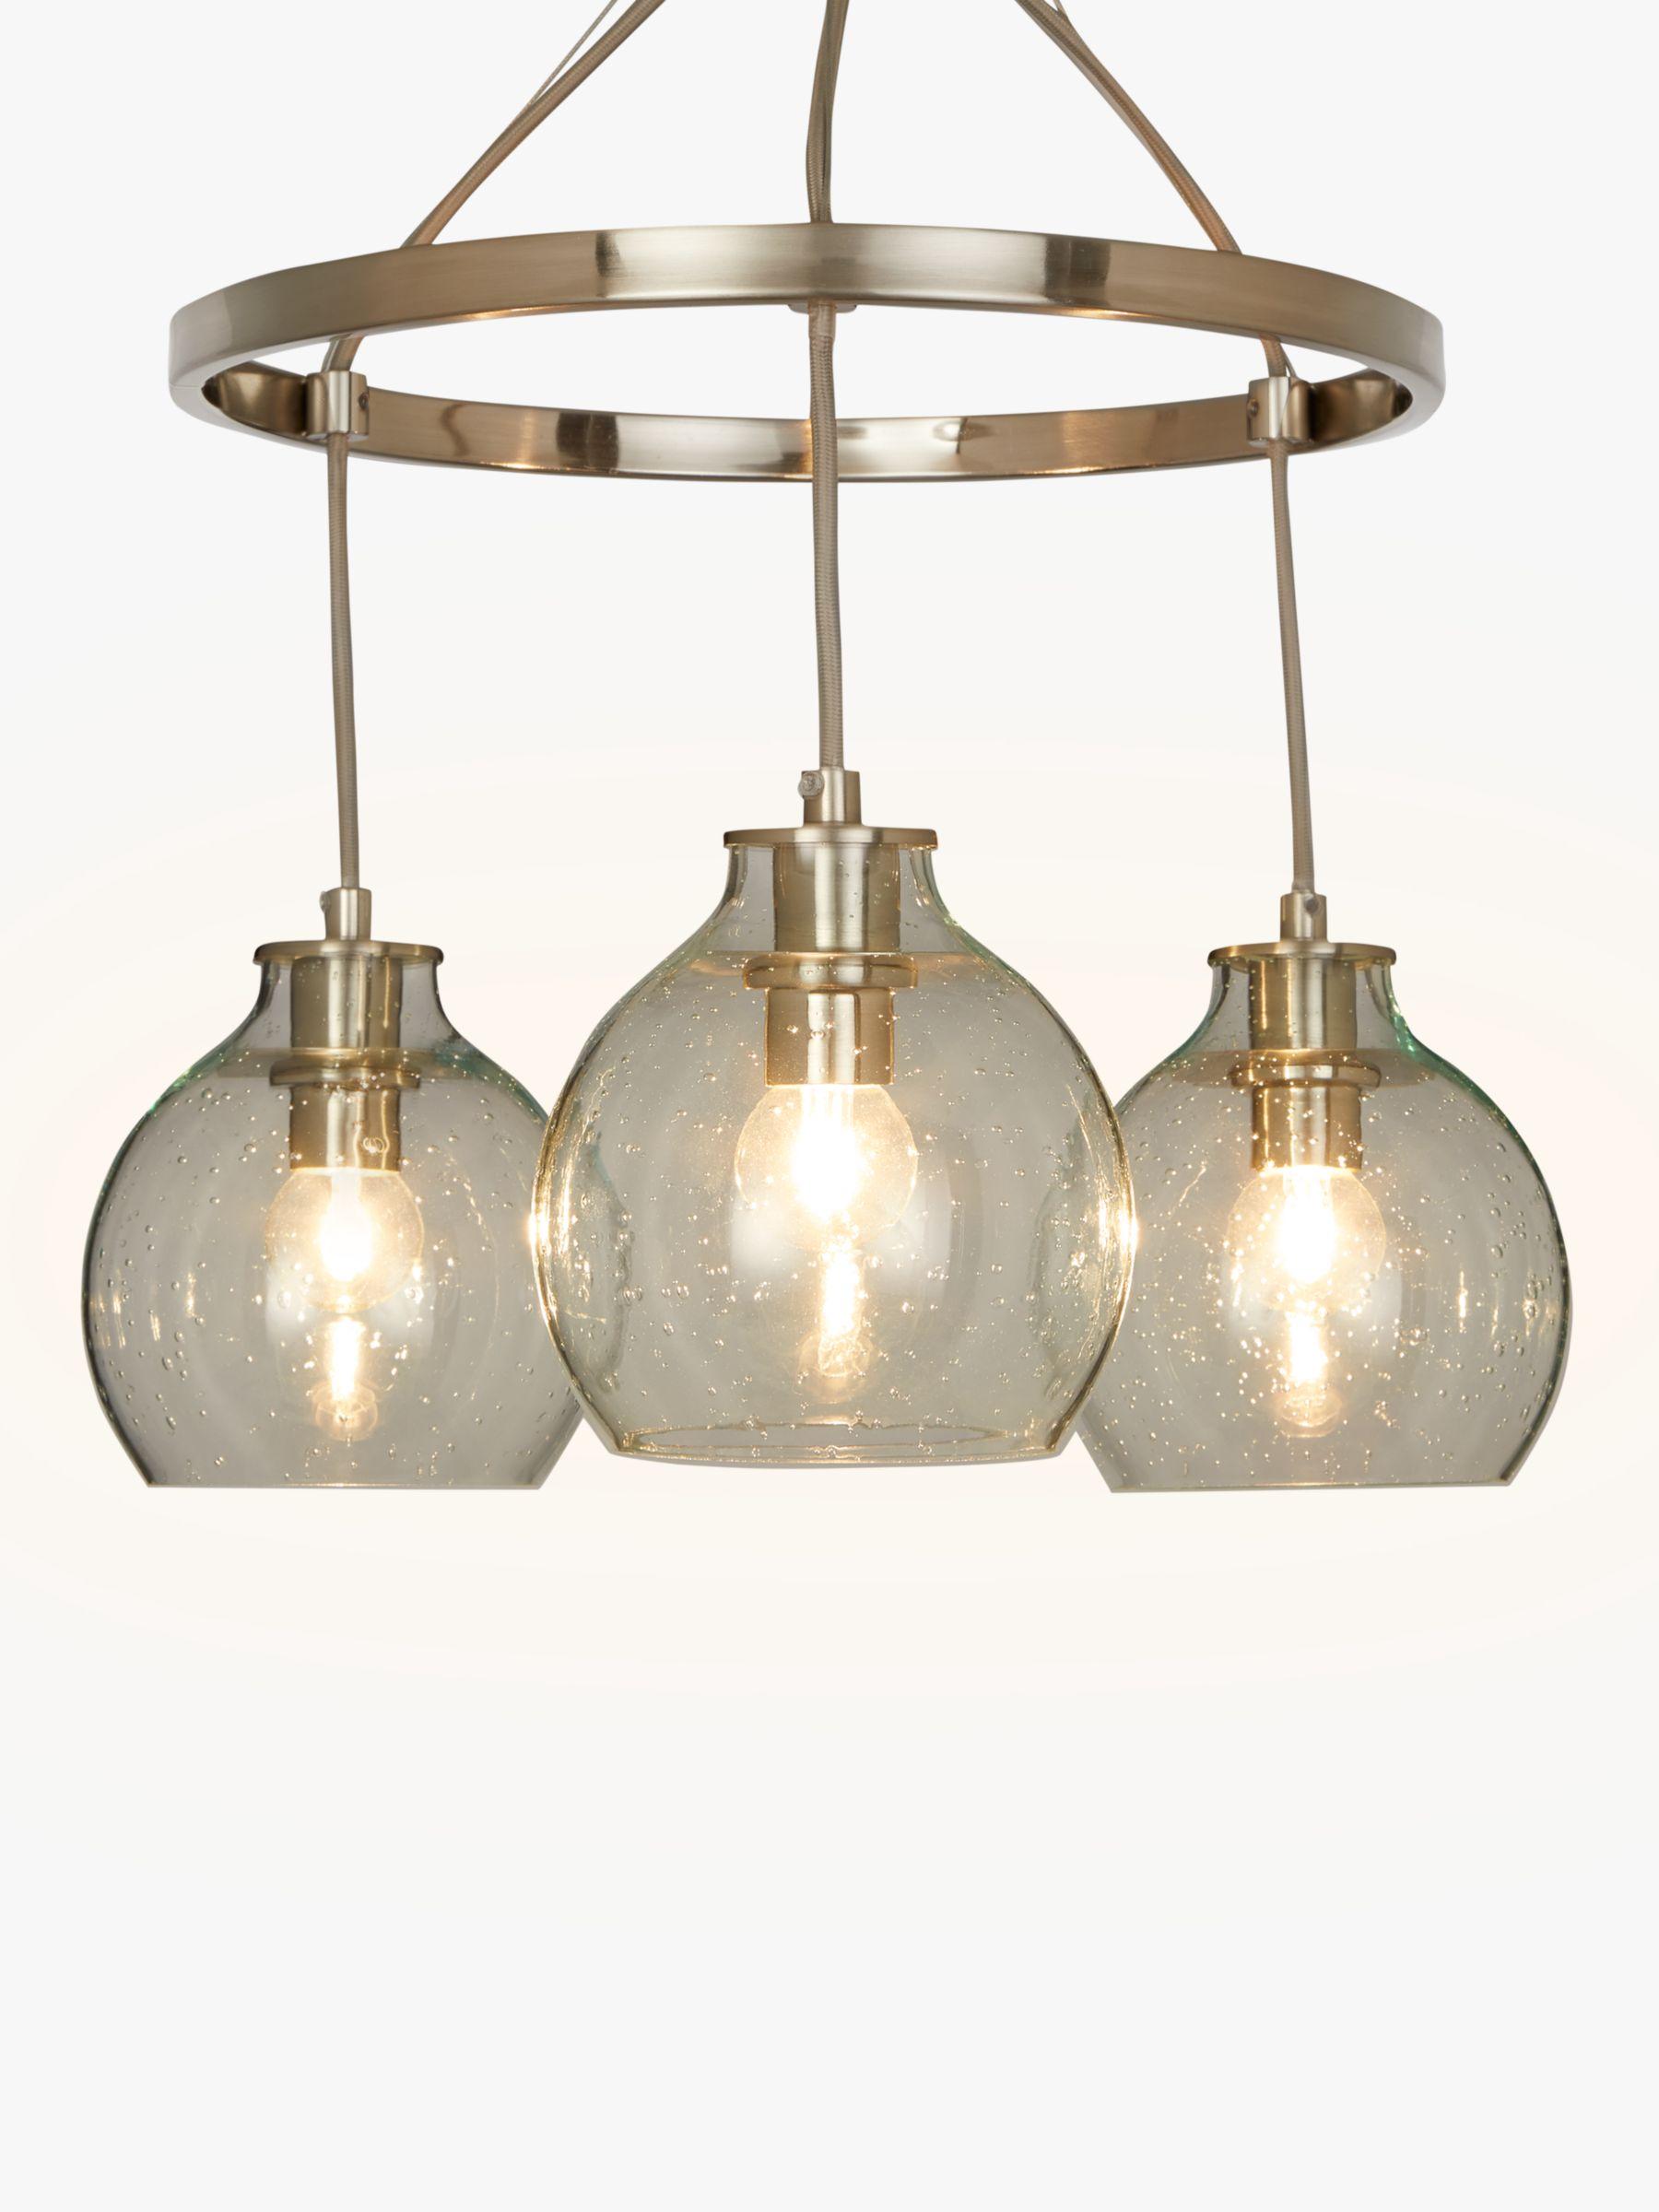 John Lewis & Partners Selsey Semi Flush, 3 Pendant Ceiling Light, Blue/Chrome